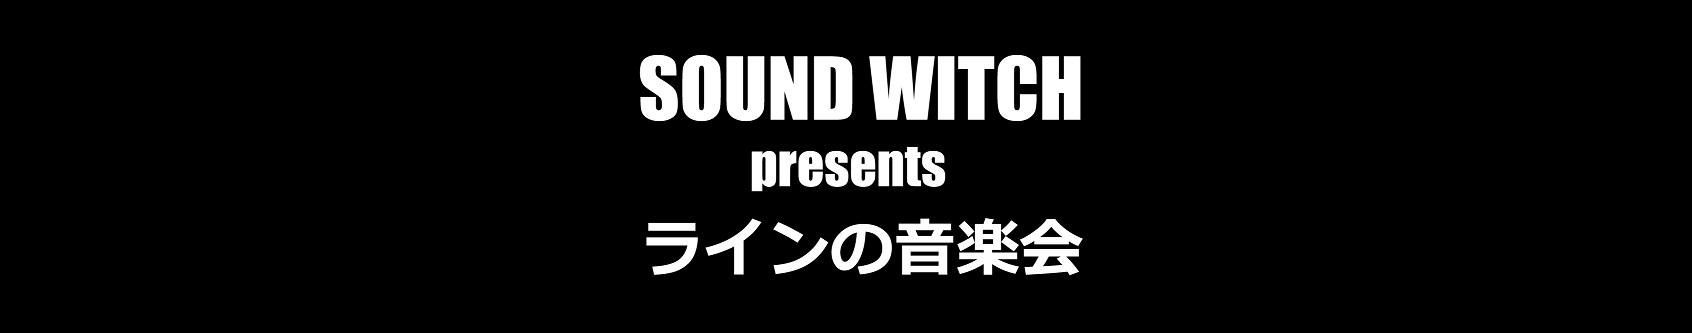 sounde